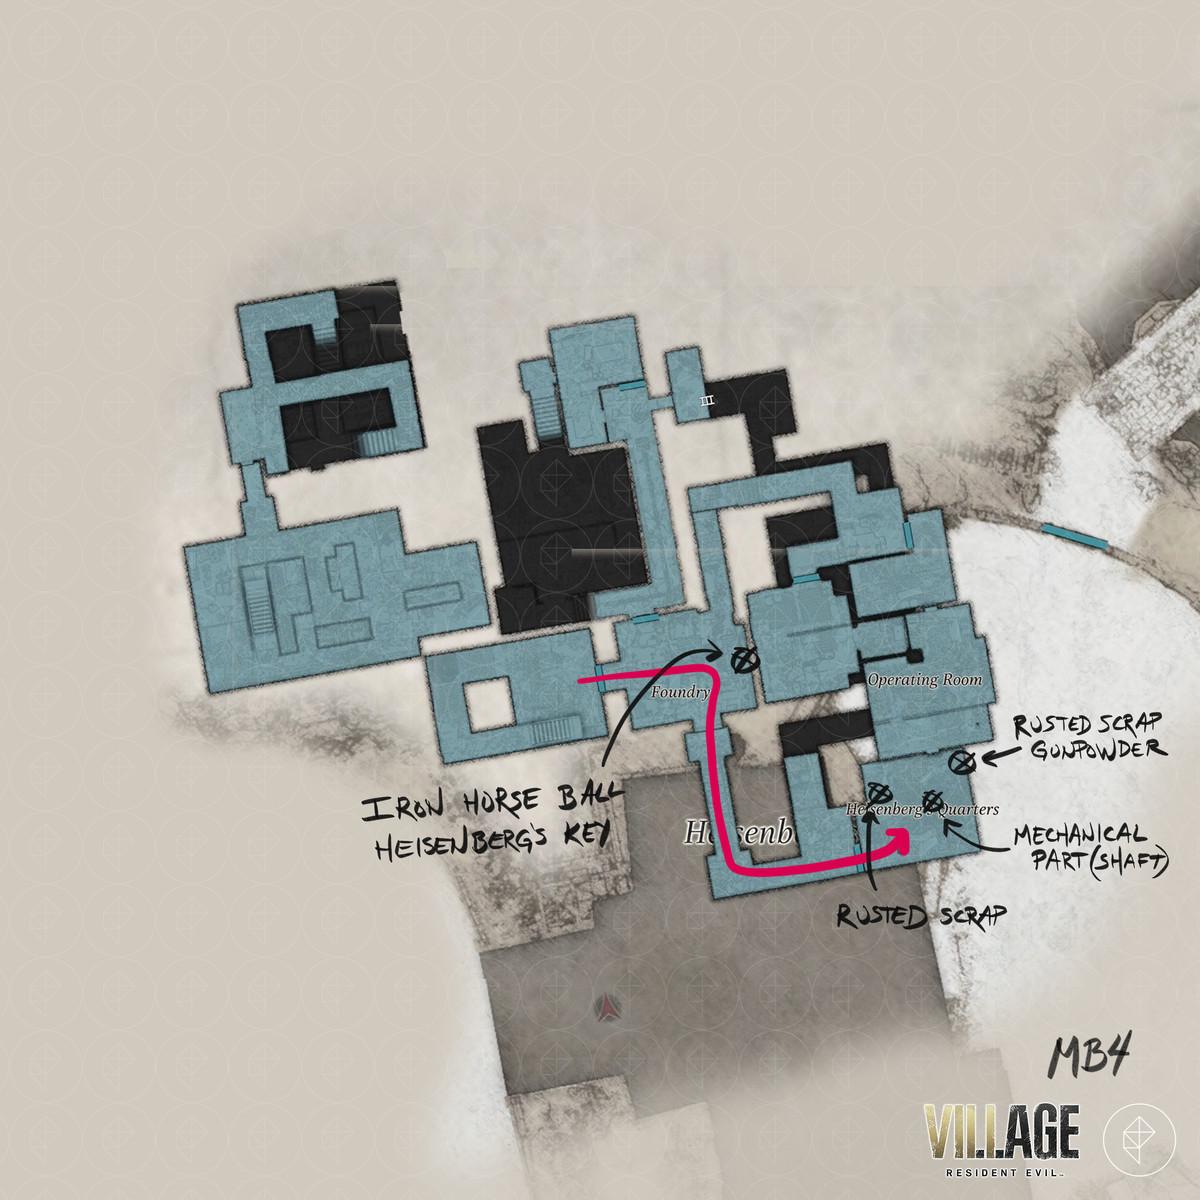 Resident Evil Village walkthrough part 15: Iron Horse Ball and Heisenberg's Key